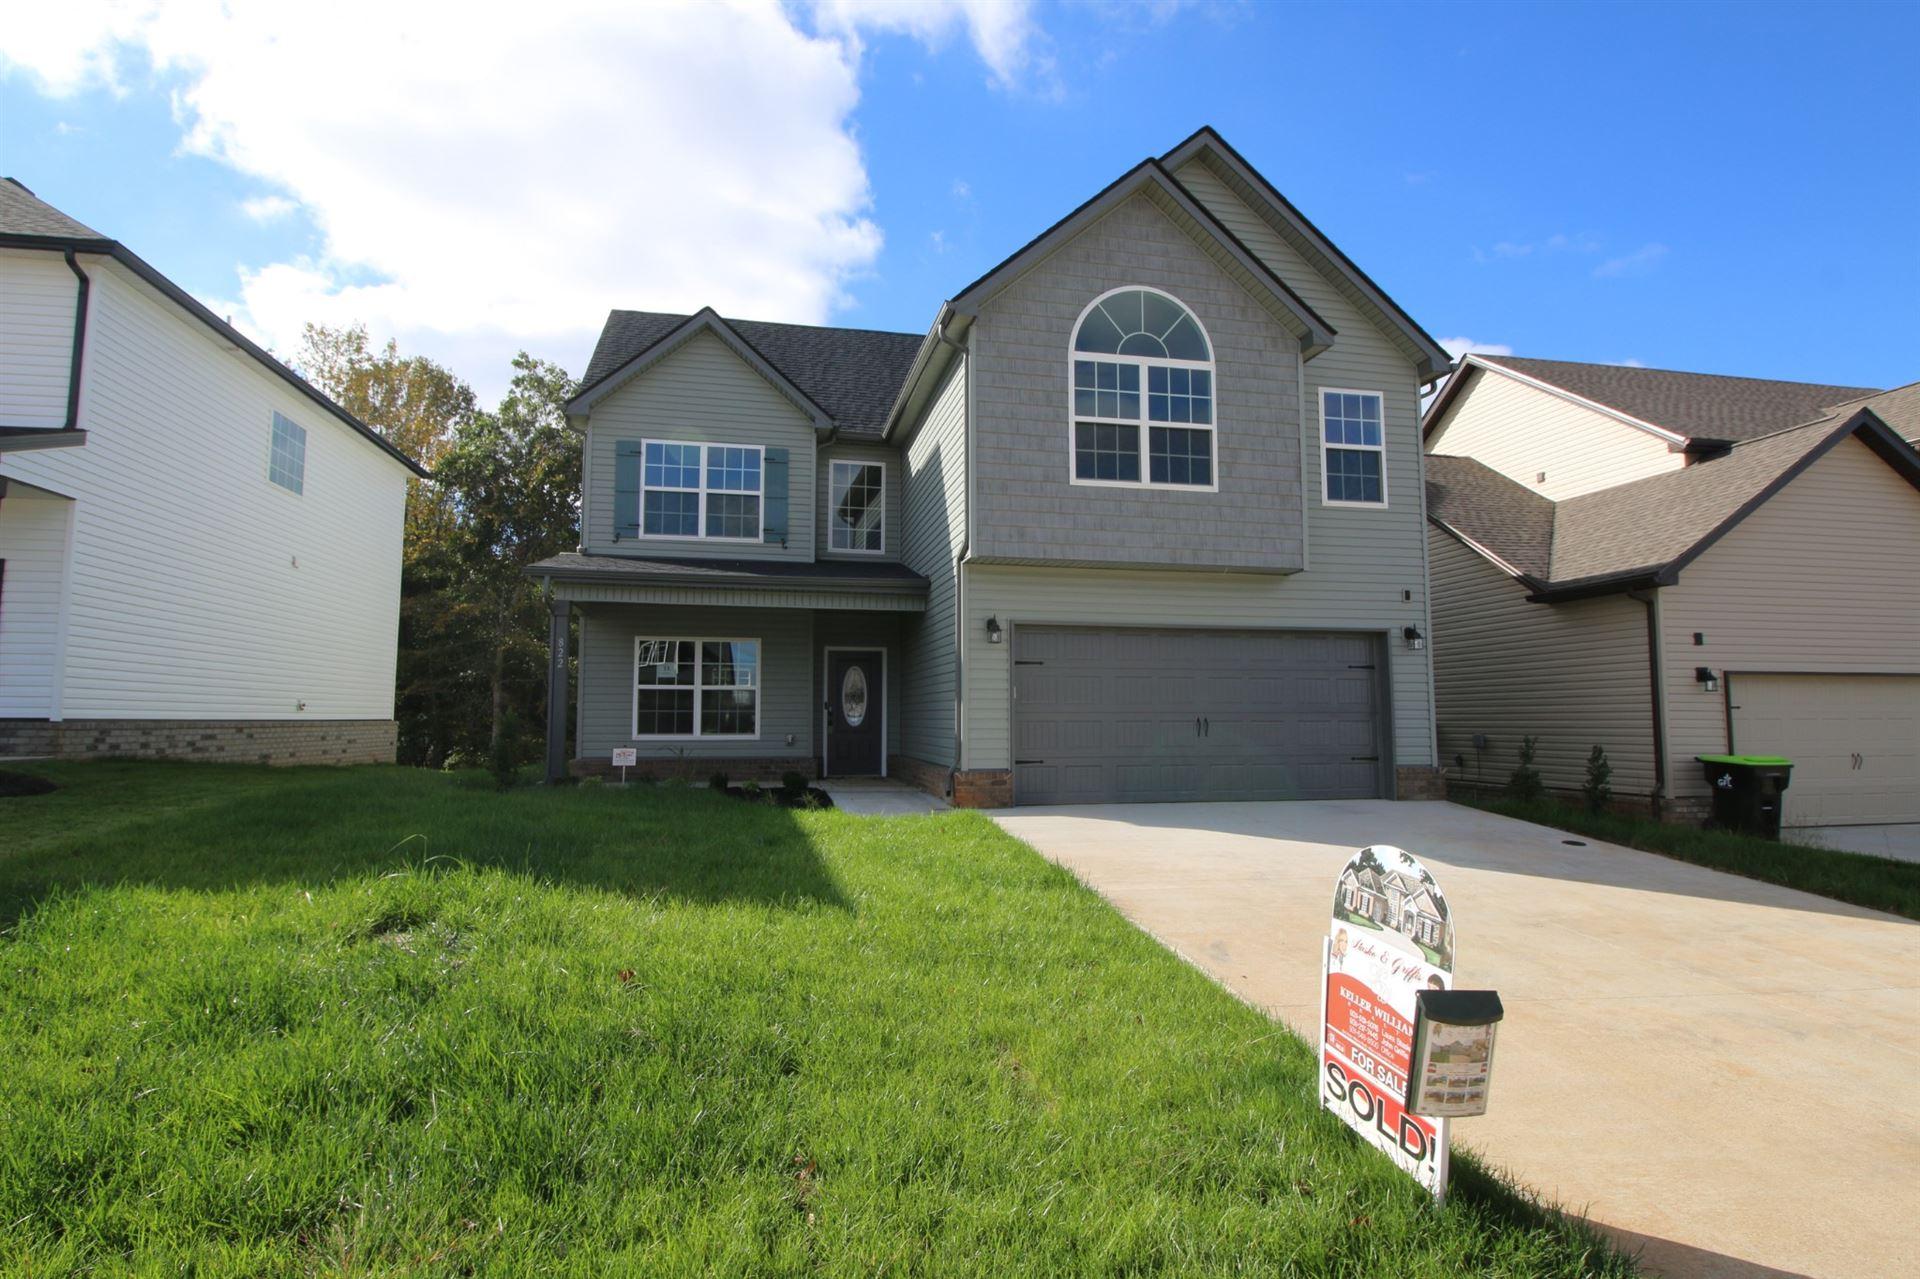 Photo of 13 Mills Creek, Clarksville, TN 37042 (MLS # 2293196)